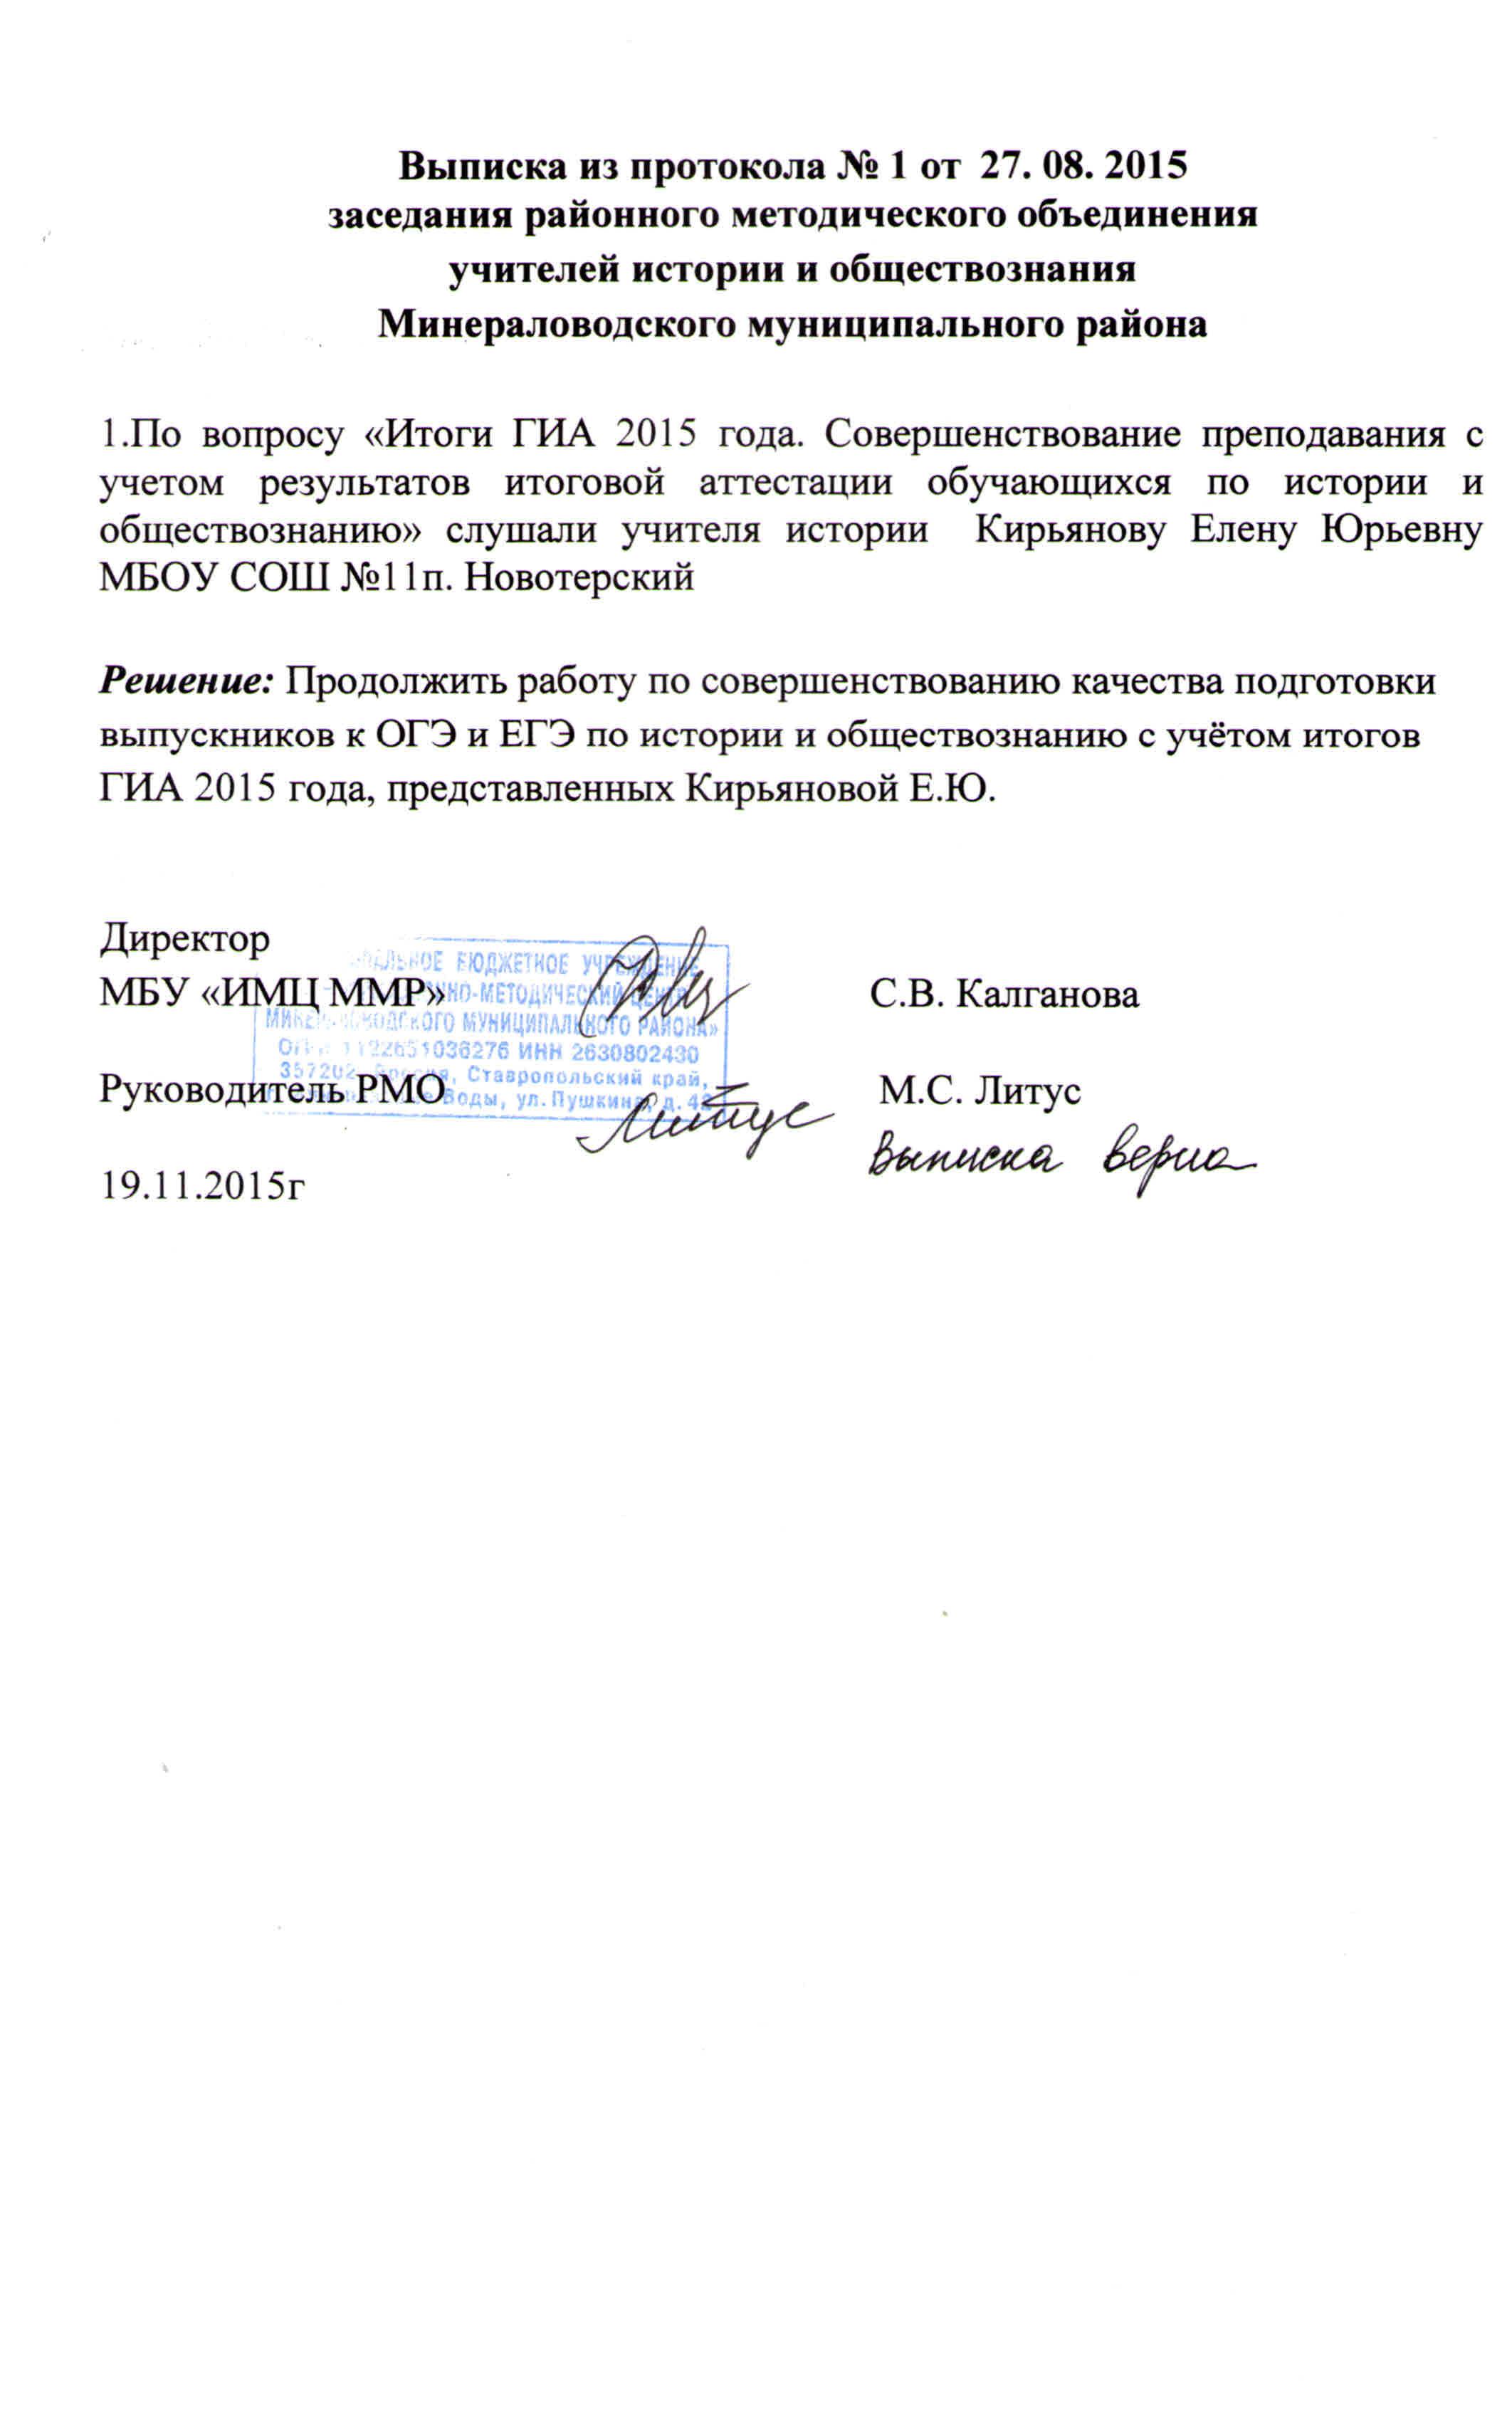 C:\Users\Сергей\Desktop\рмо\Document_2.jpg